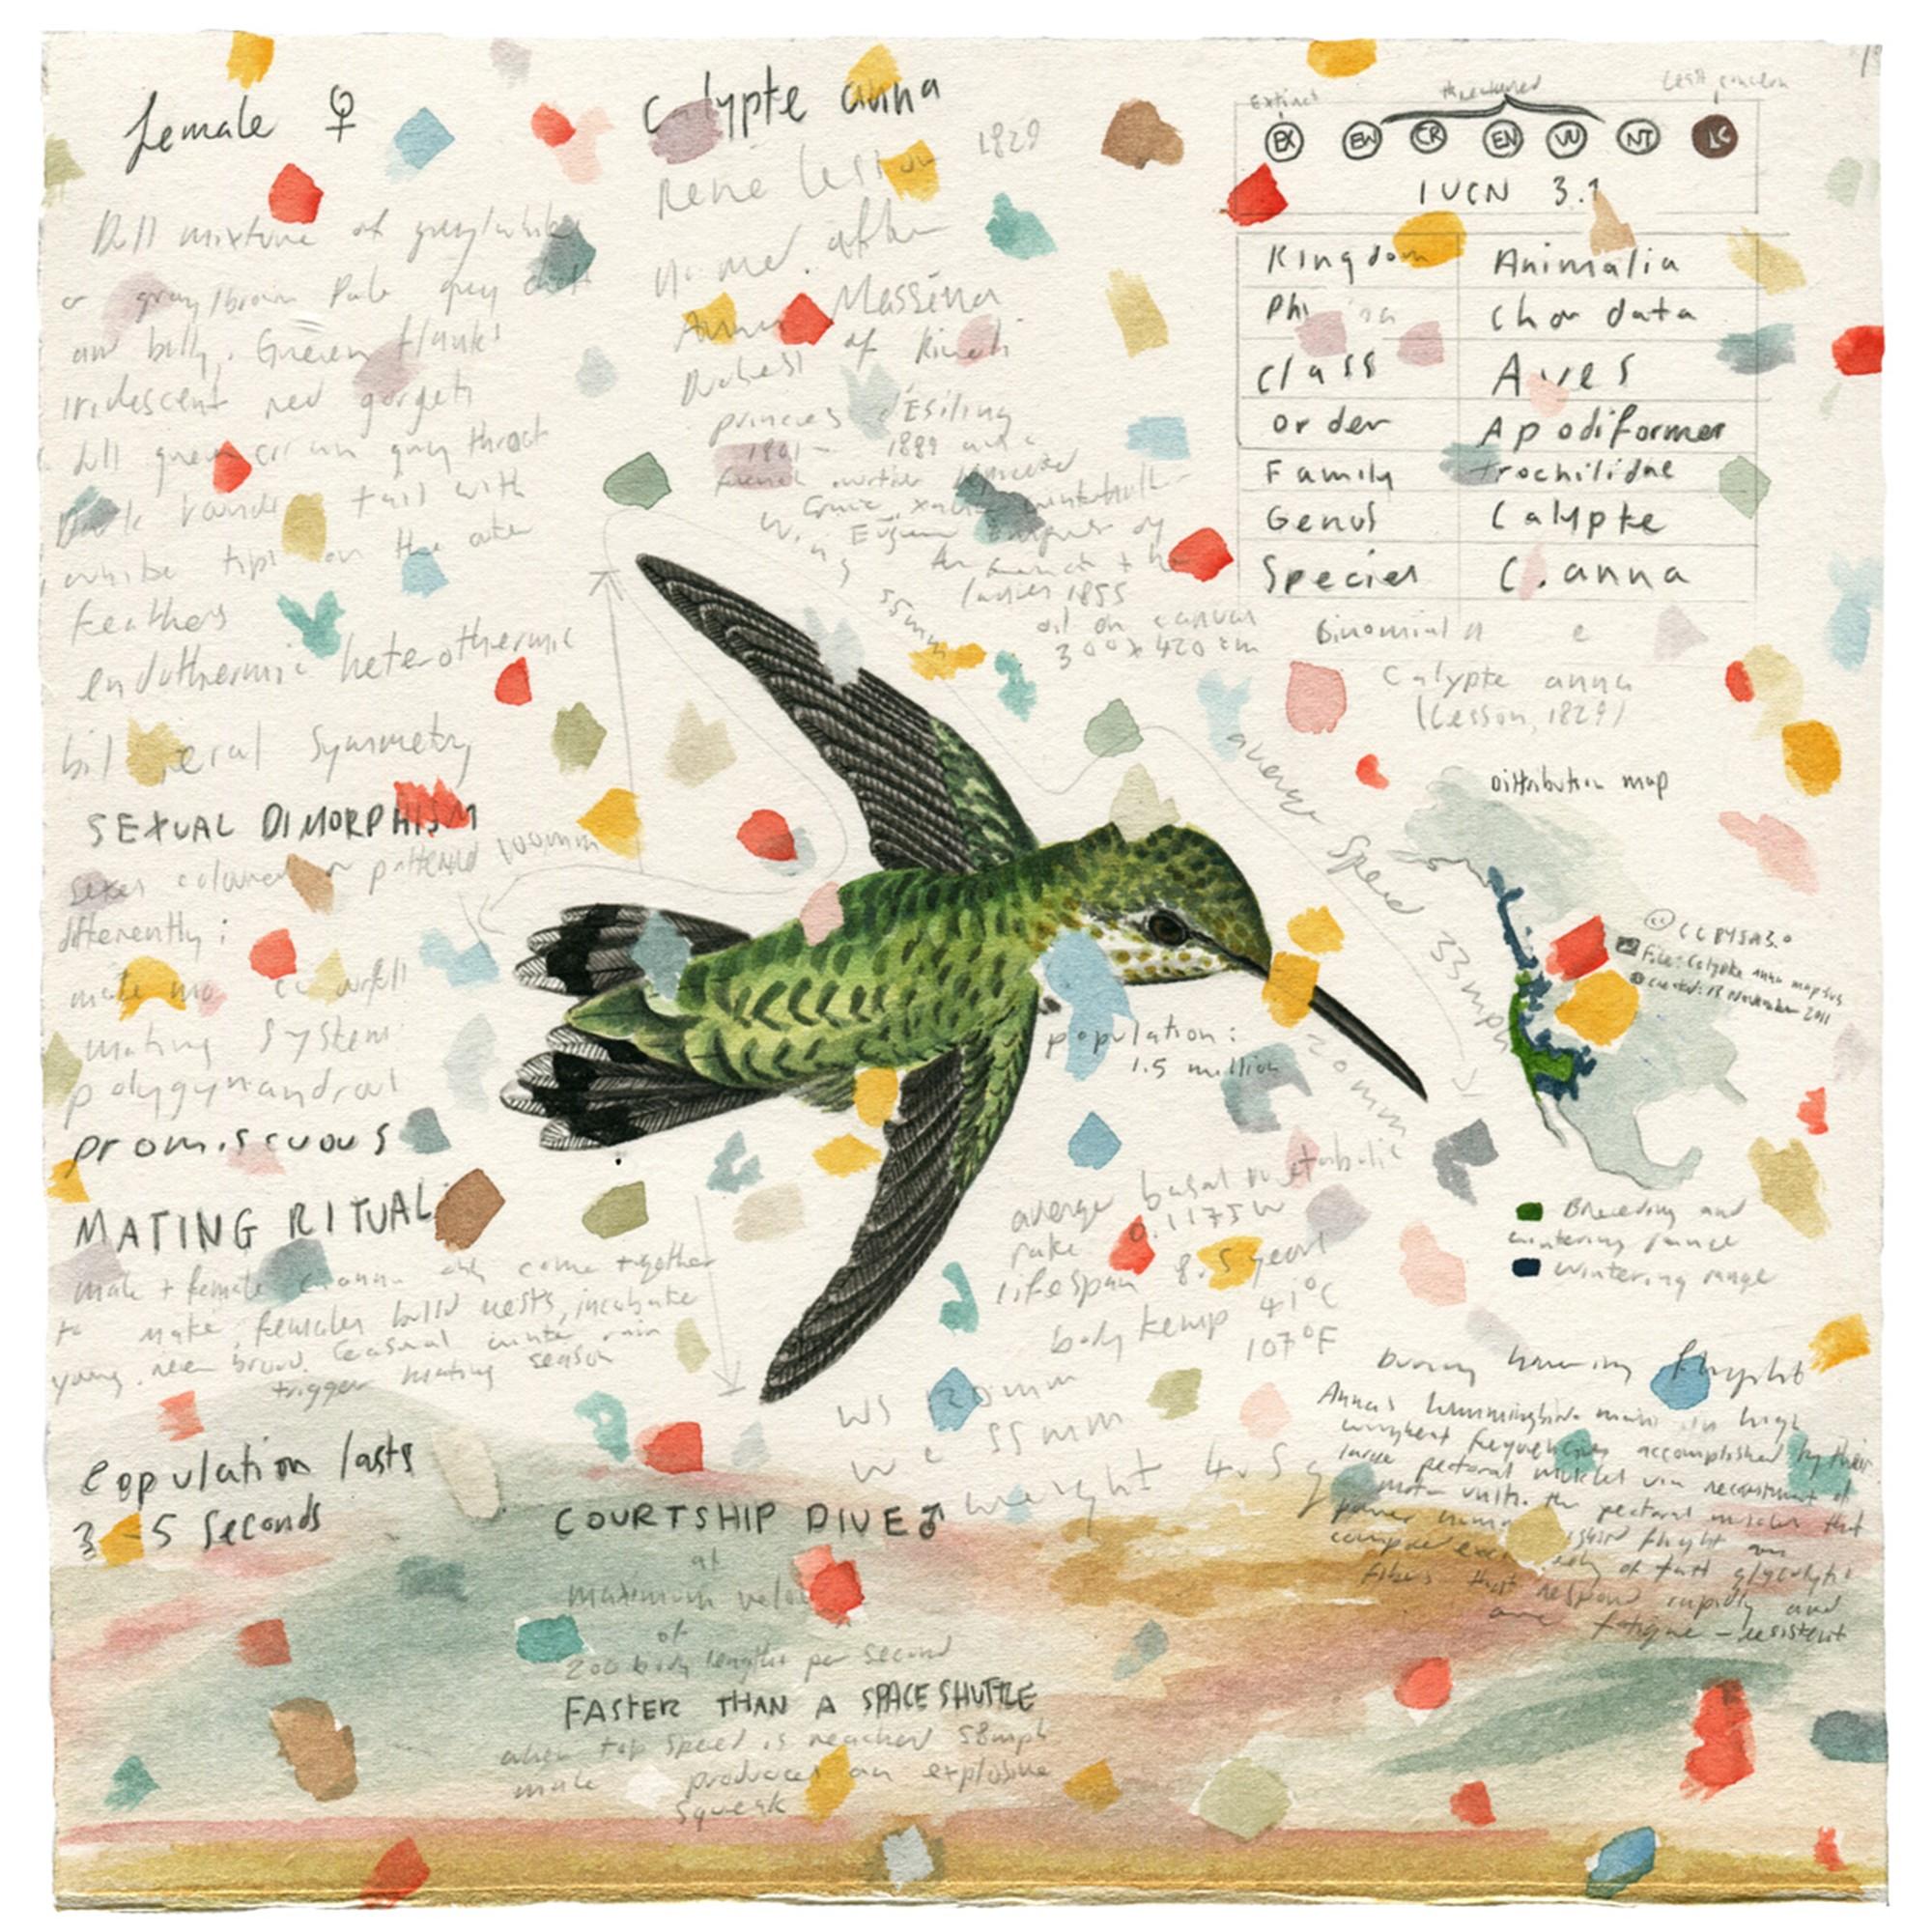 Hummingbird 010 'Anna's' -